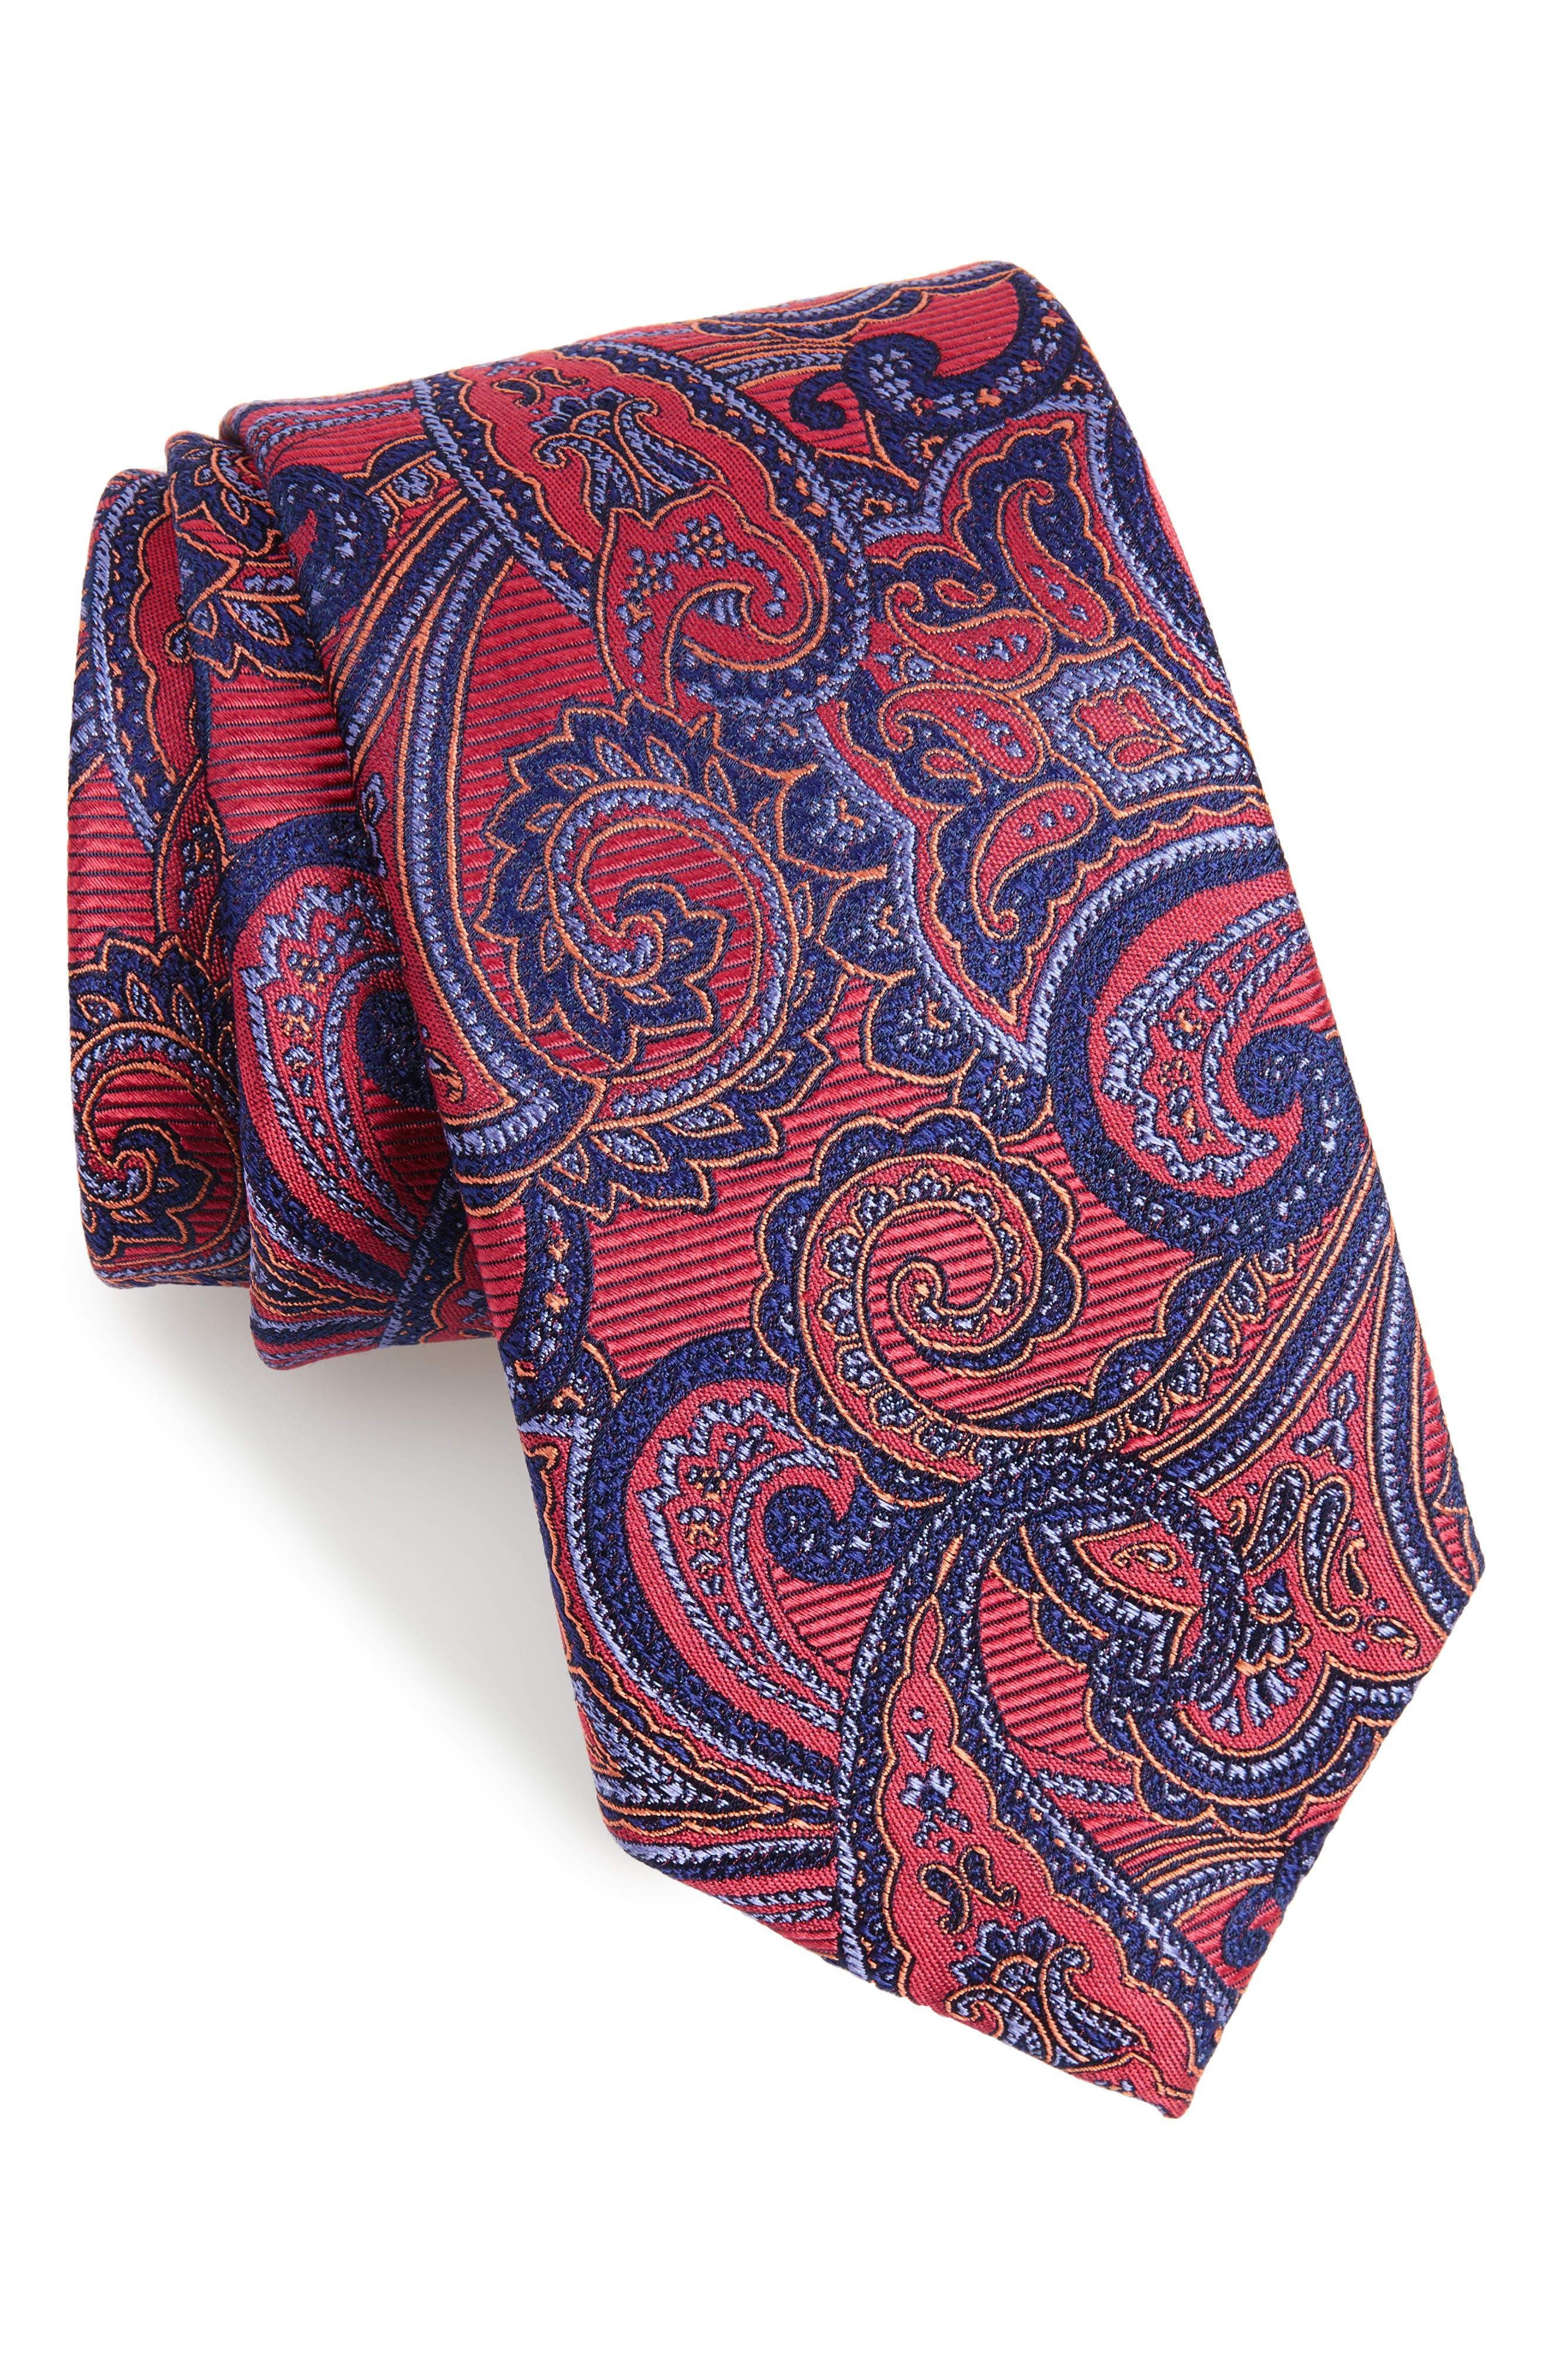 Alternate Image 1 Selected - Nordstrom Men's Shop Avalon Paisley Silk Tie (X-Long)